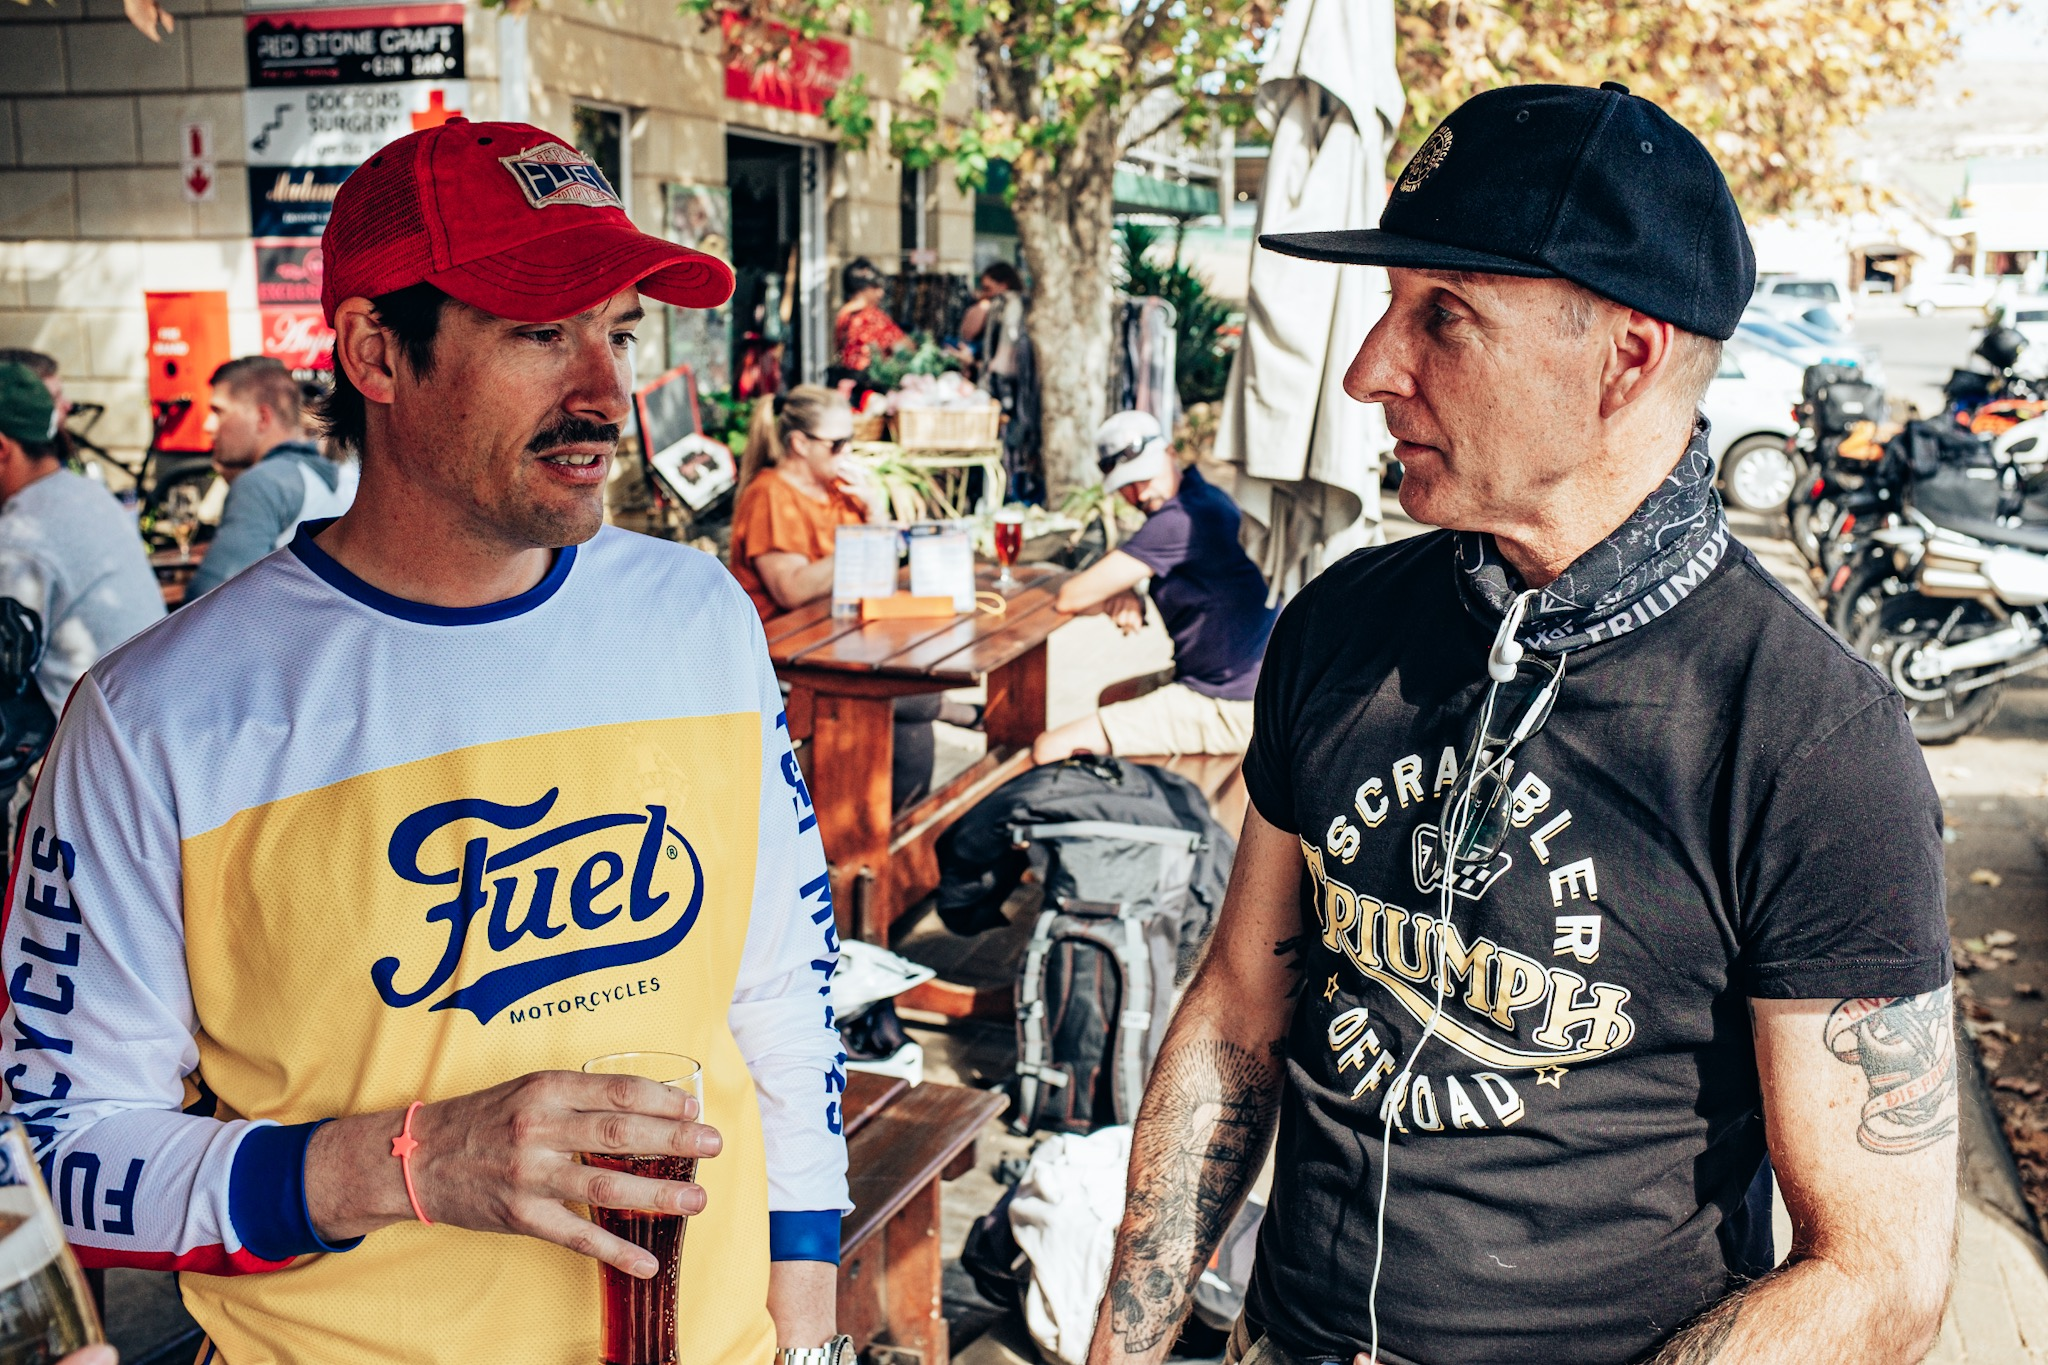 Fuel Motorcycles and the Triumph Scrambler showdown on the Bonafide Moto Adventure to Sani Pass